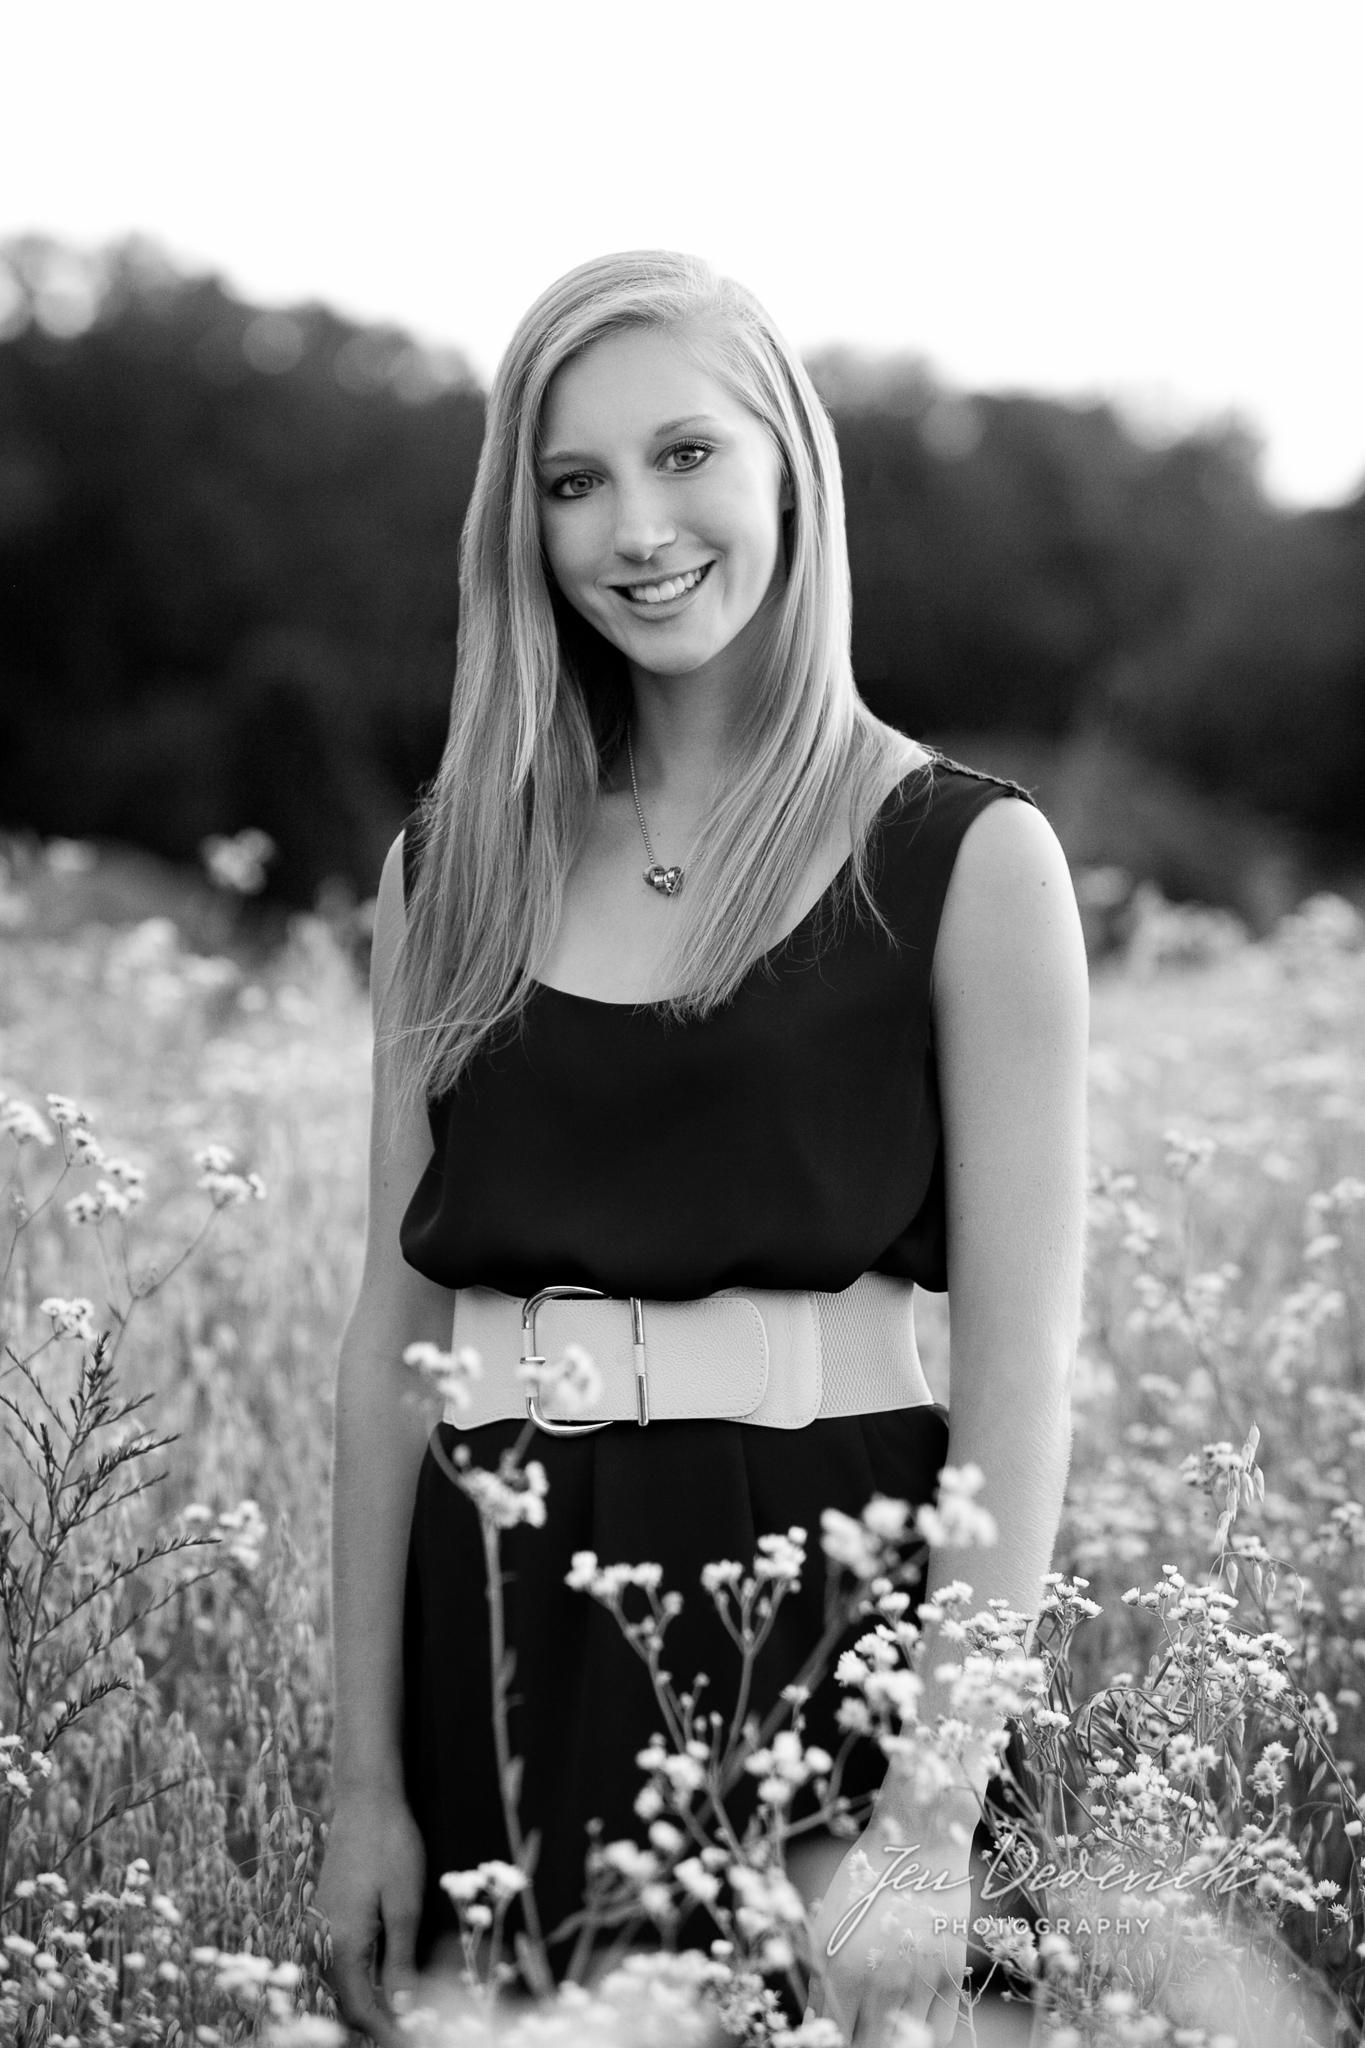 Senior_Madison WI_Jen Dederich Photography_012.jpg